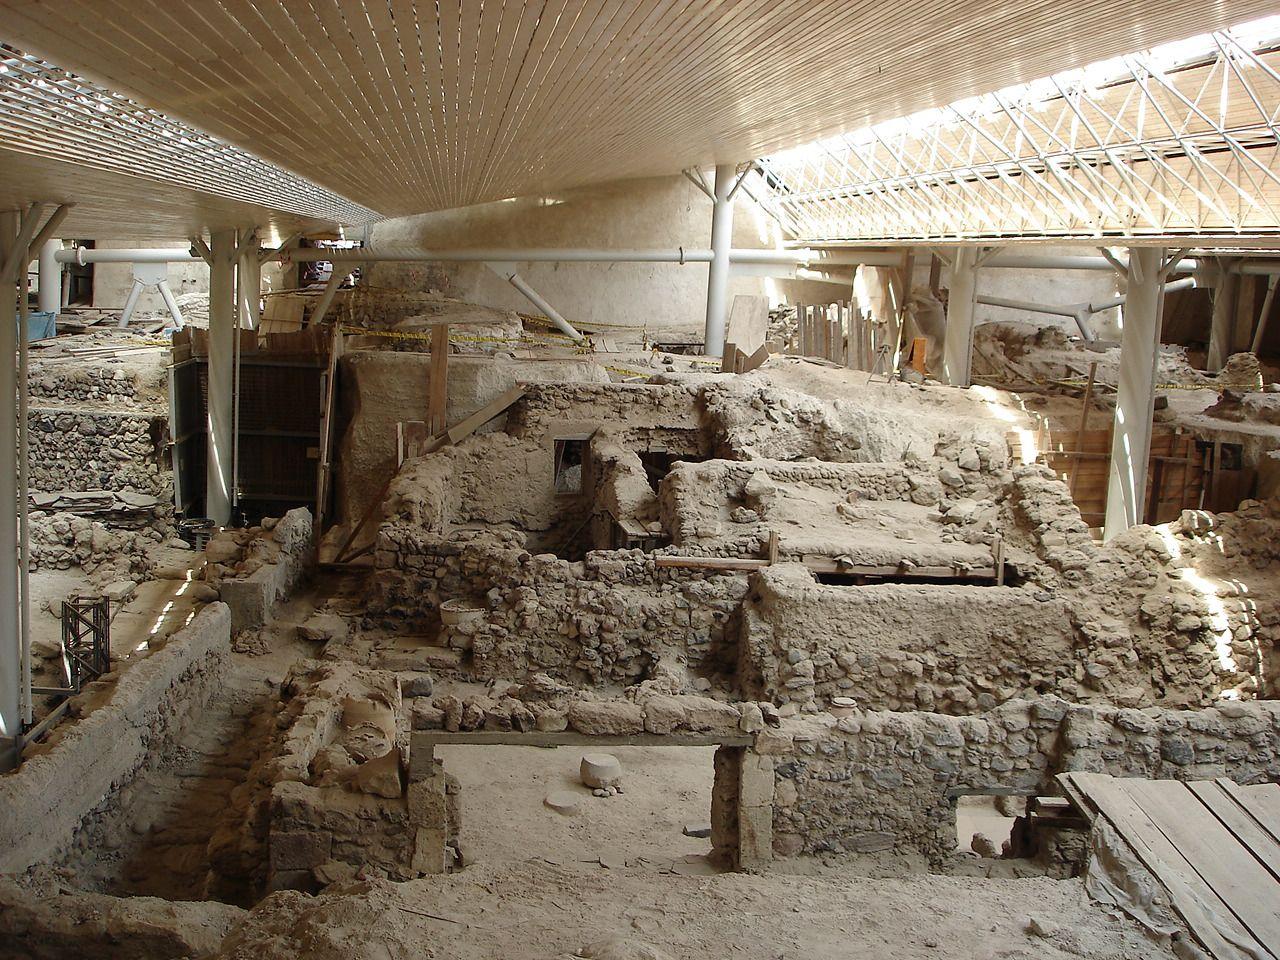 Prehistoric_Site_of_Akrotiri,_Santorini_-_Greece.jpg